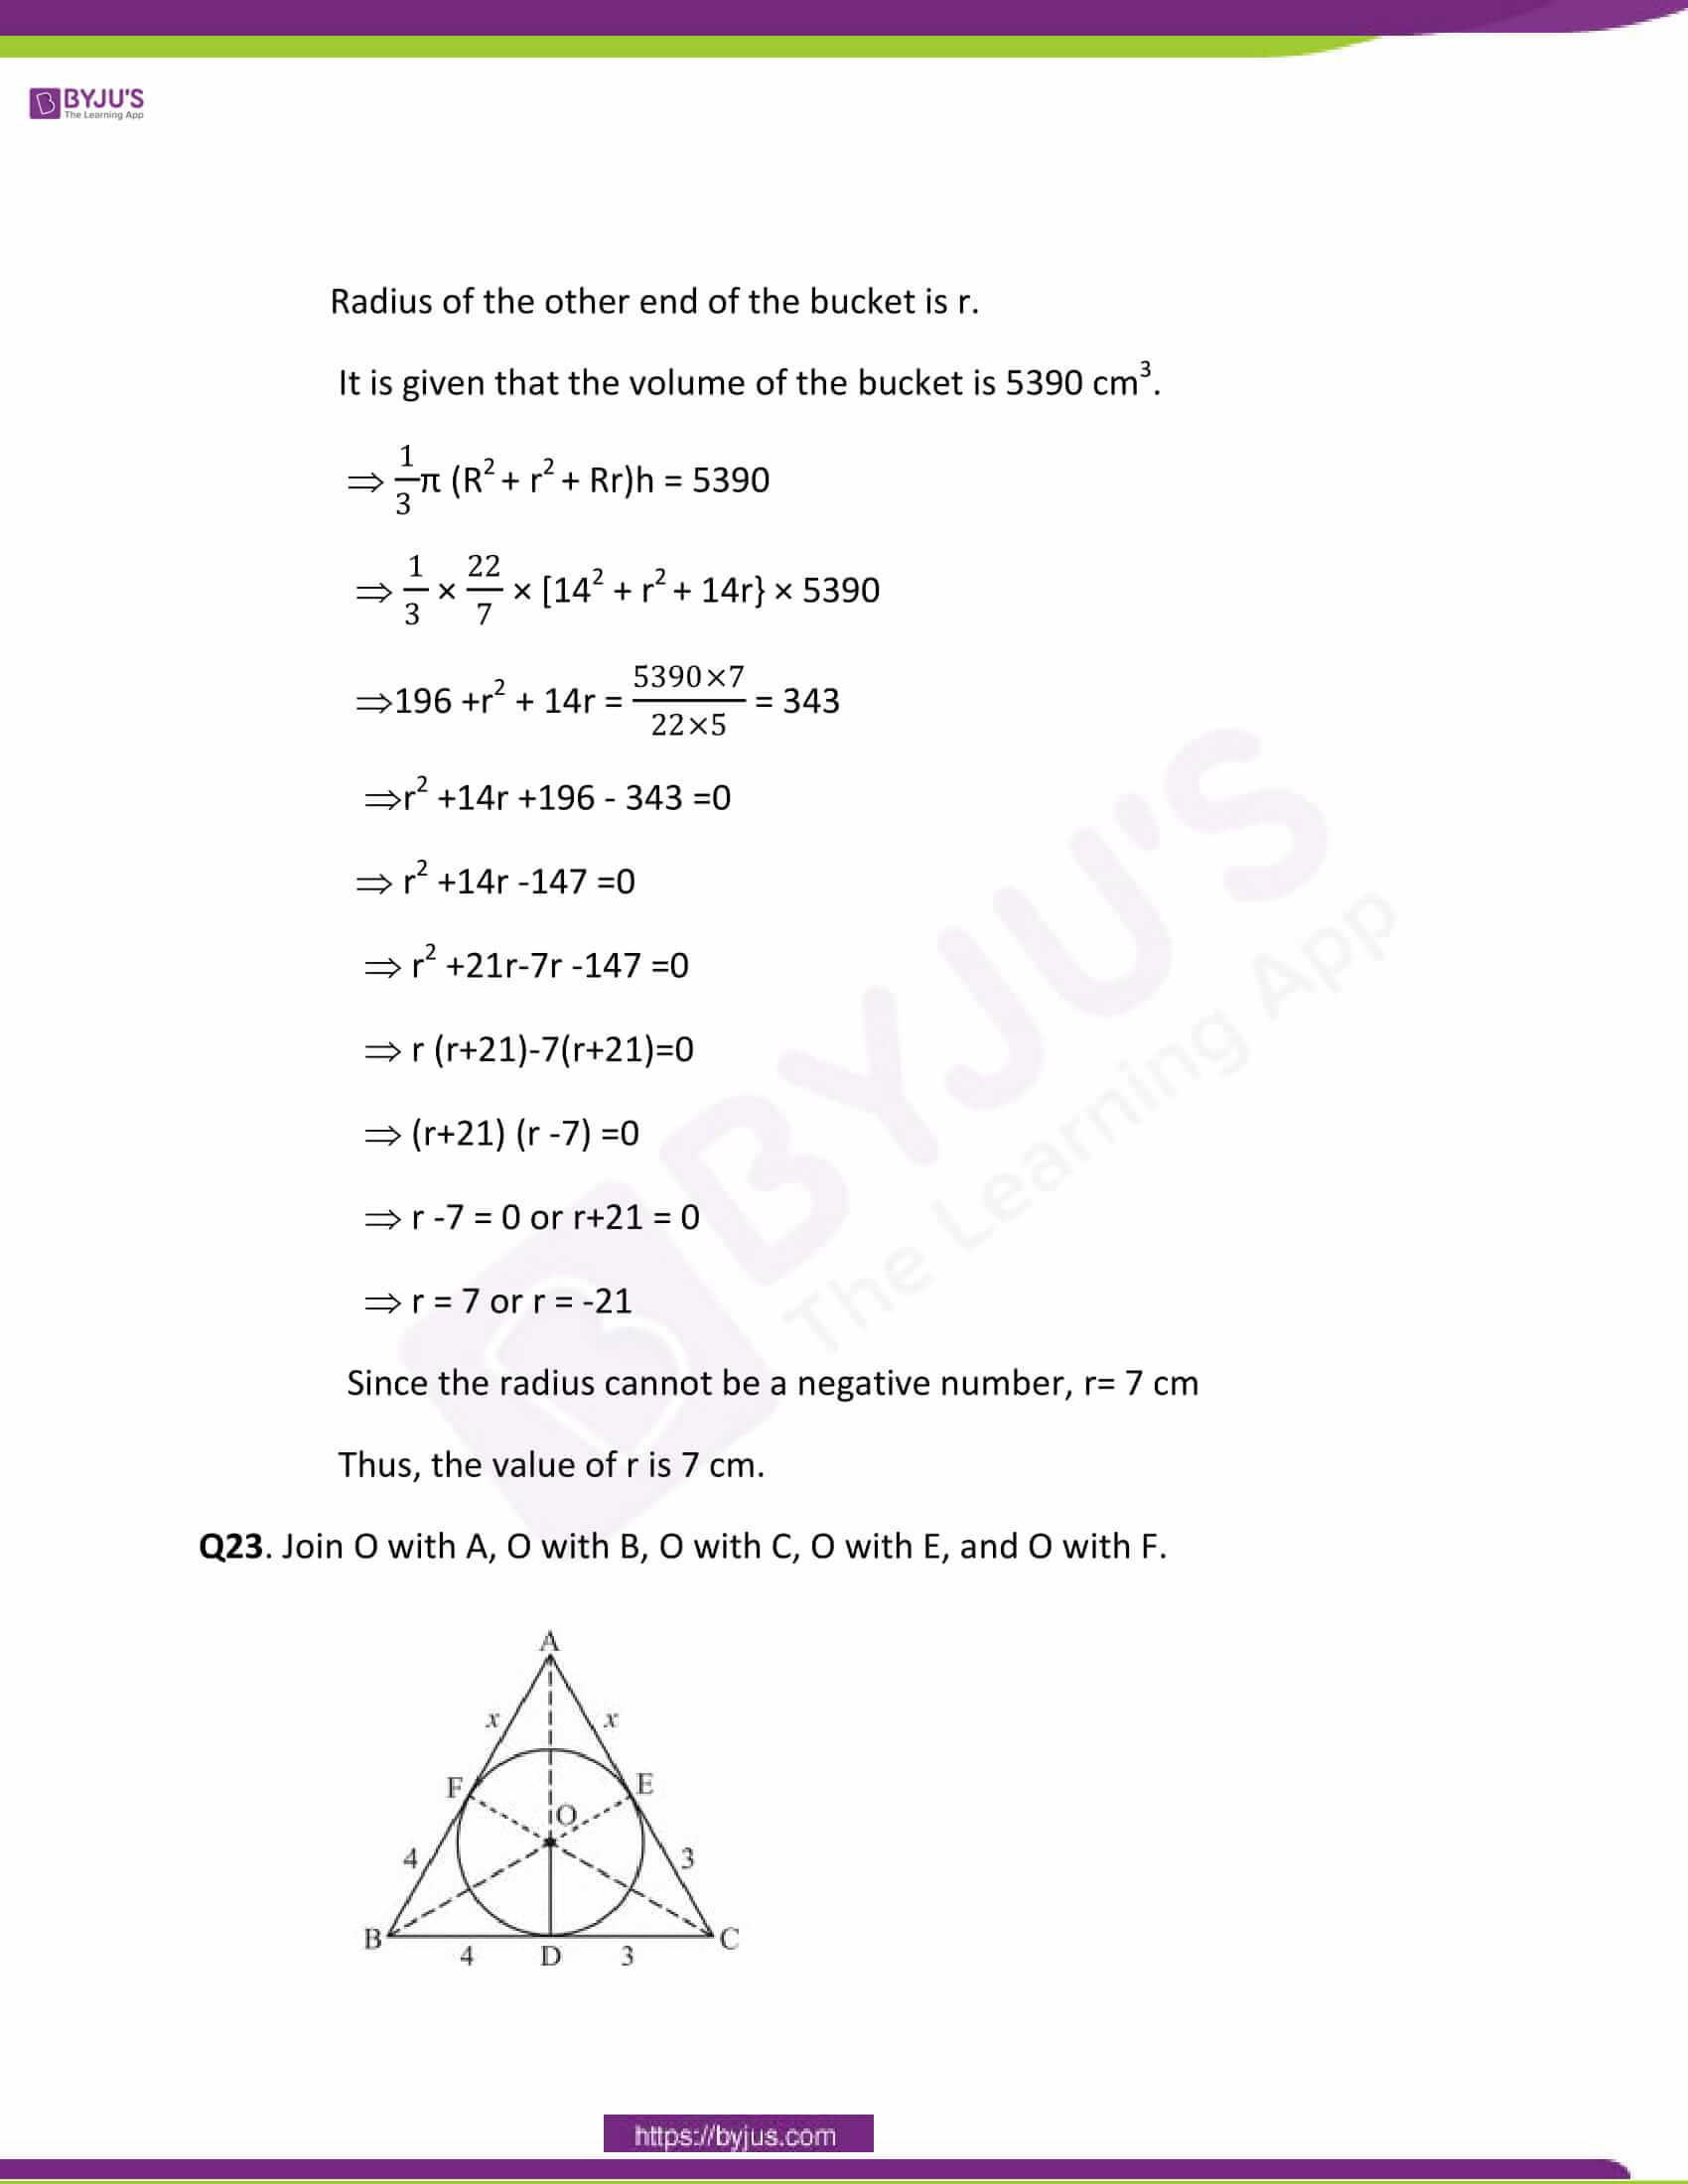 CBSE Class 10 Maths Papers Solution 2011 16